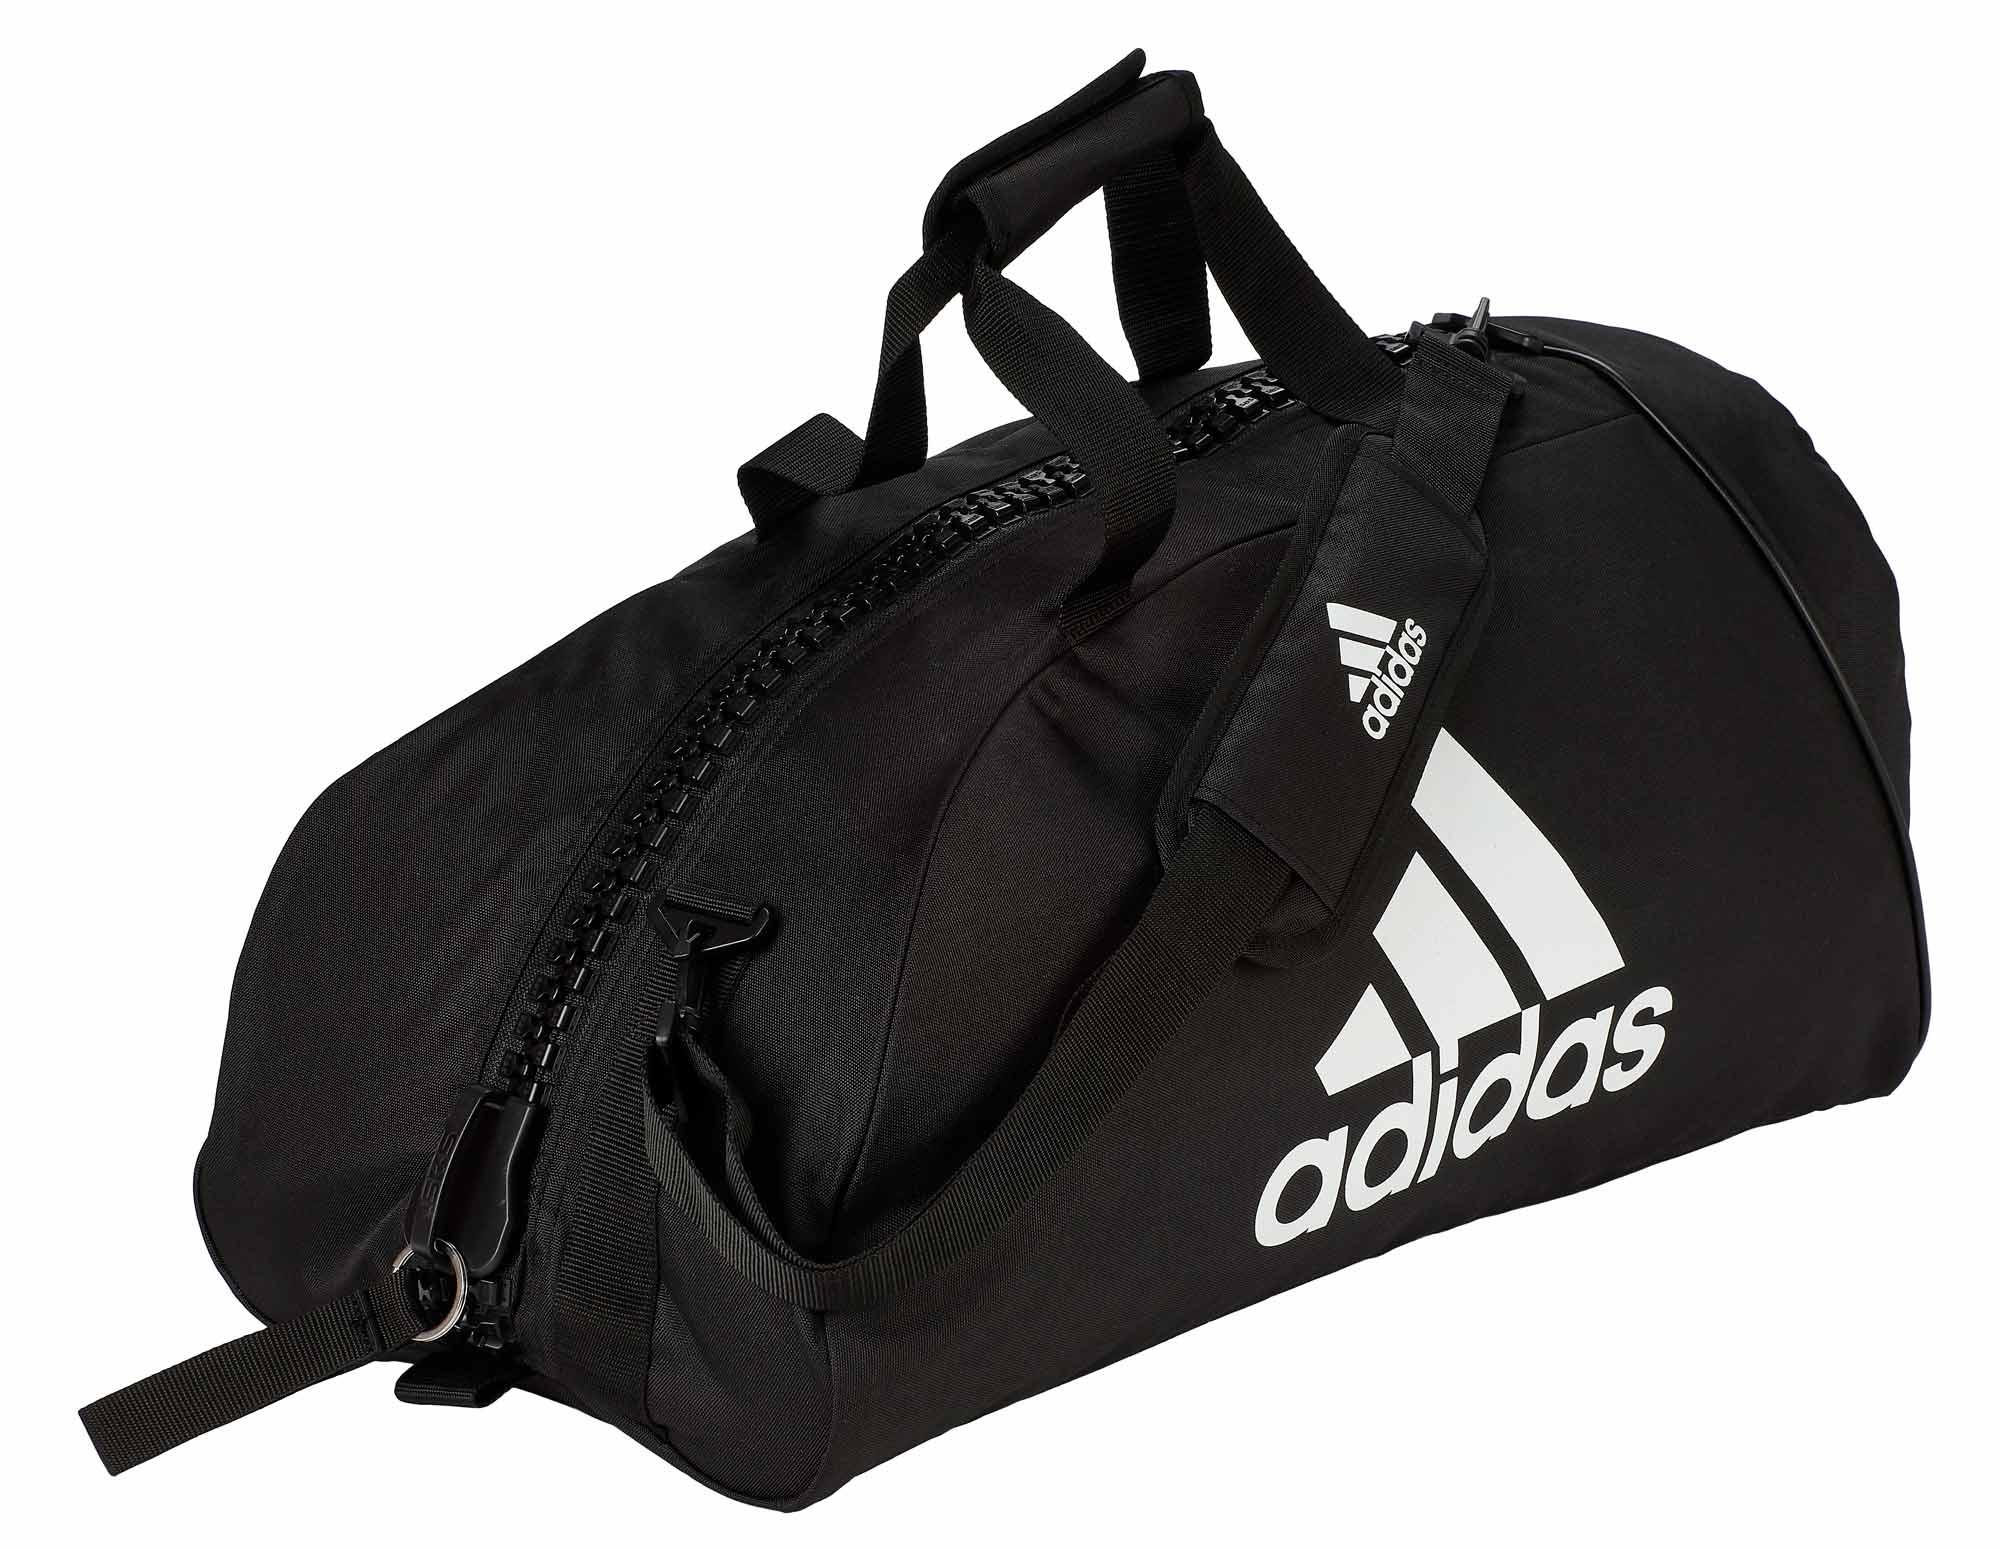 882c0a3fd1ccc ... adiACC055 · Vorschau  adidas Sporttasche